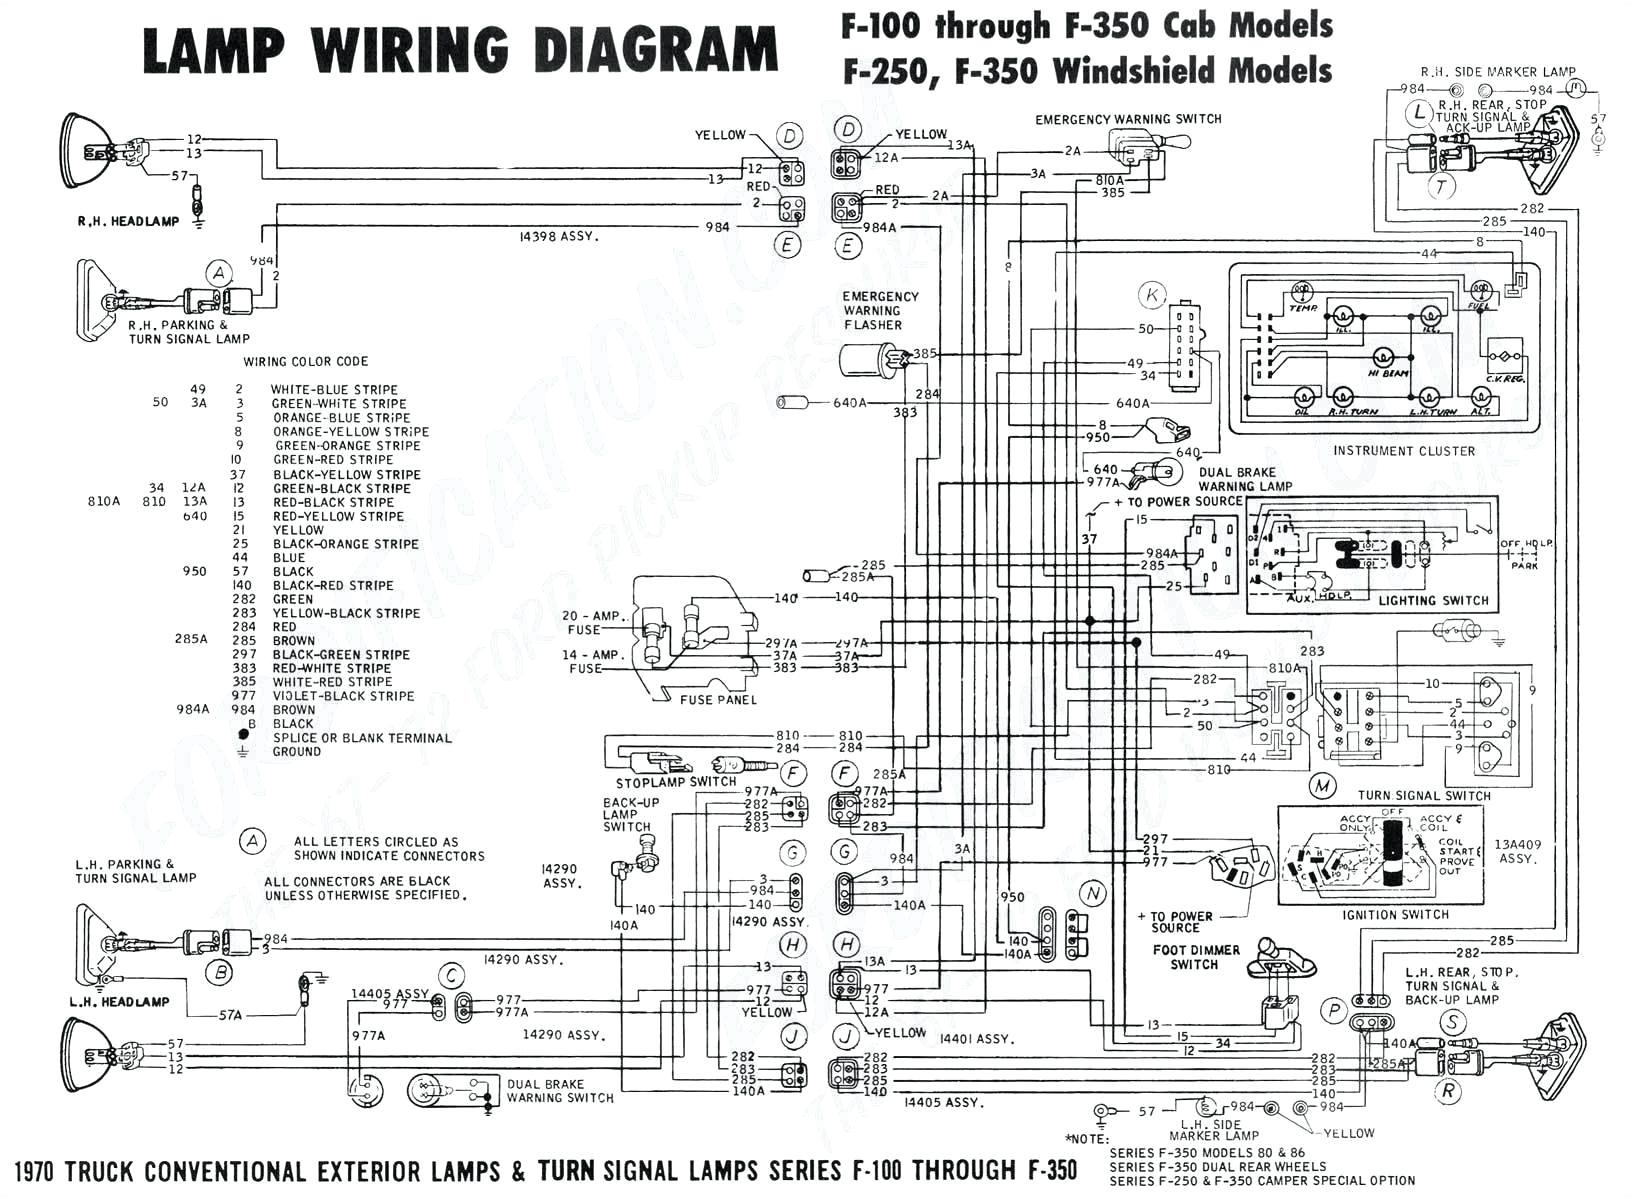 1999 Dakota Headlight Wiring Diagram F6 Wiring Diagram